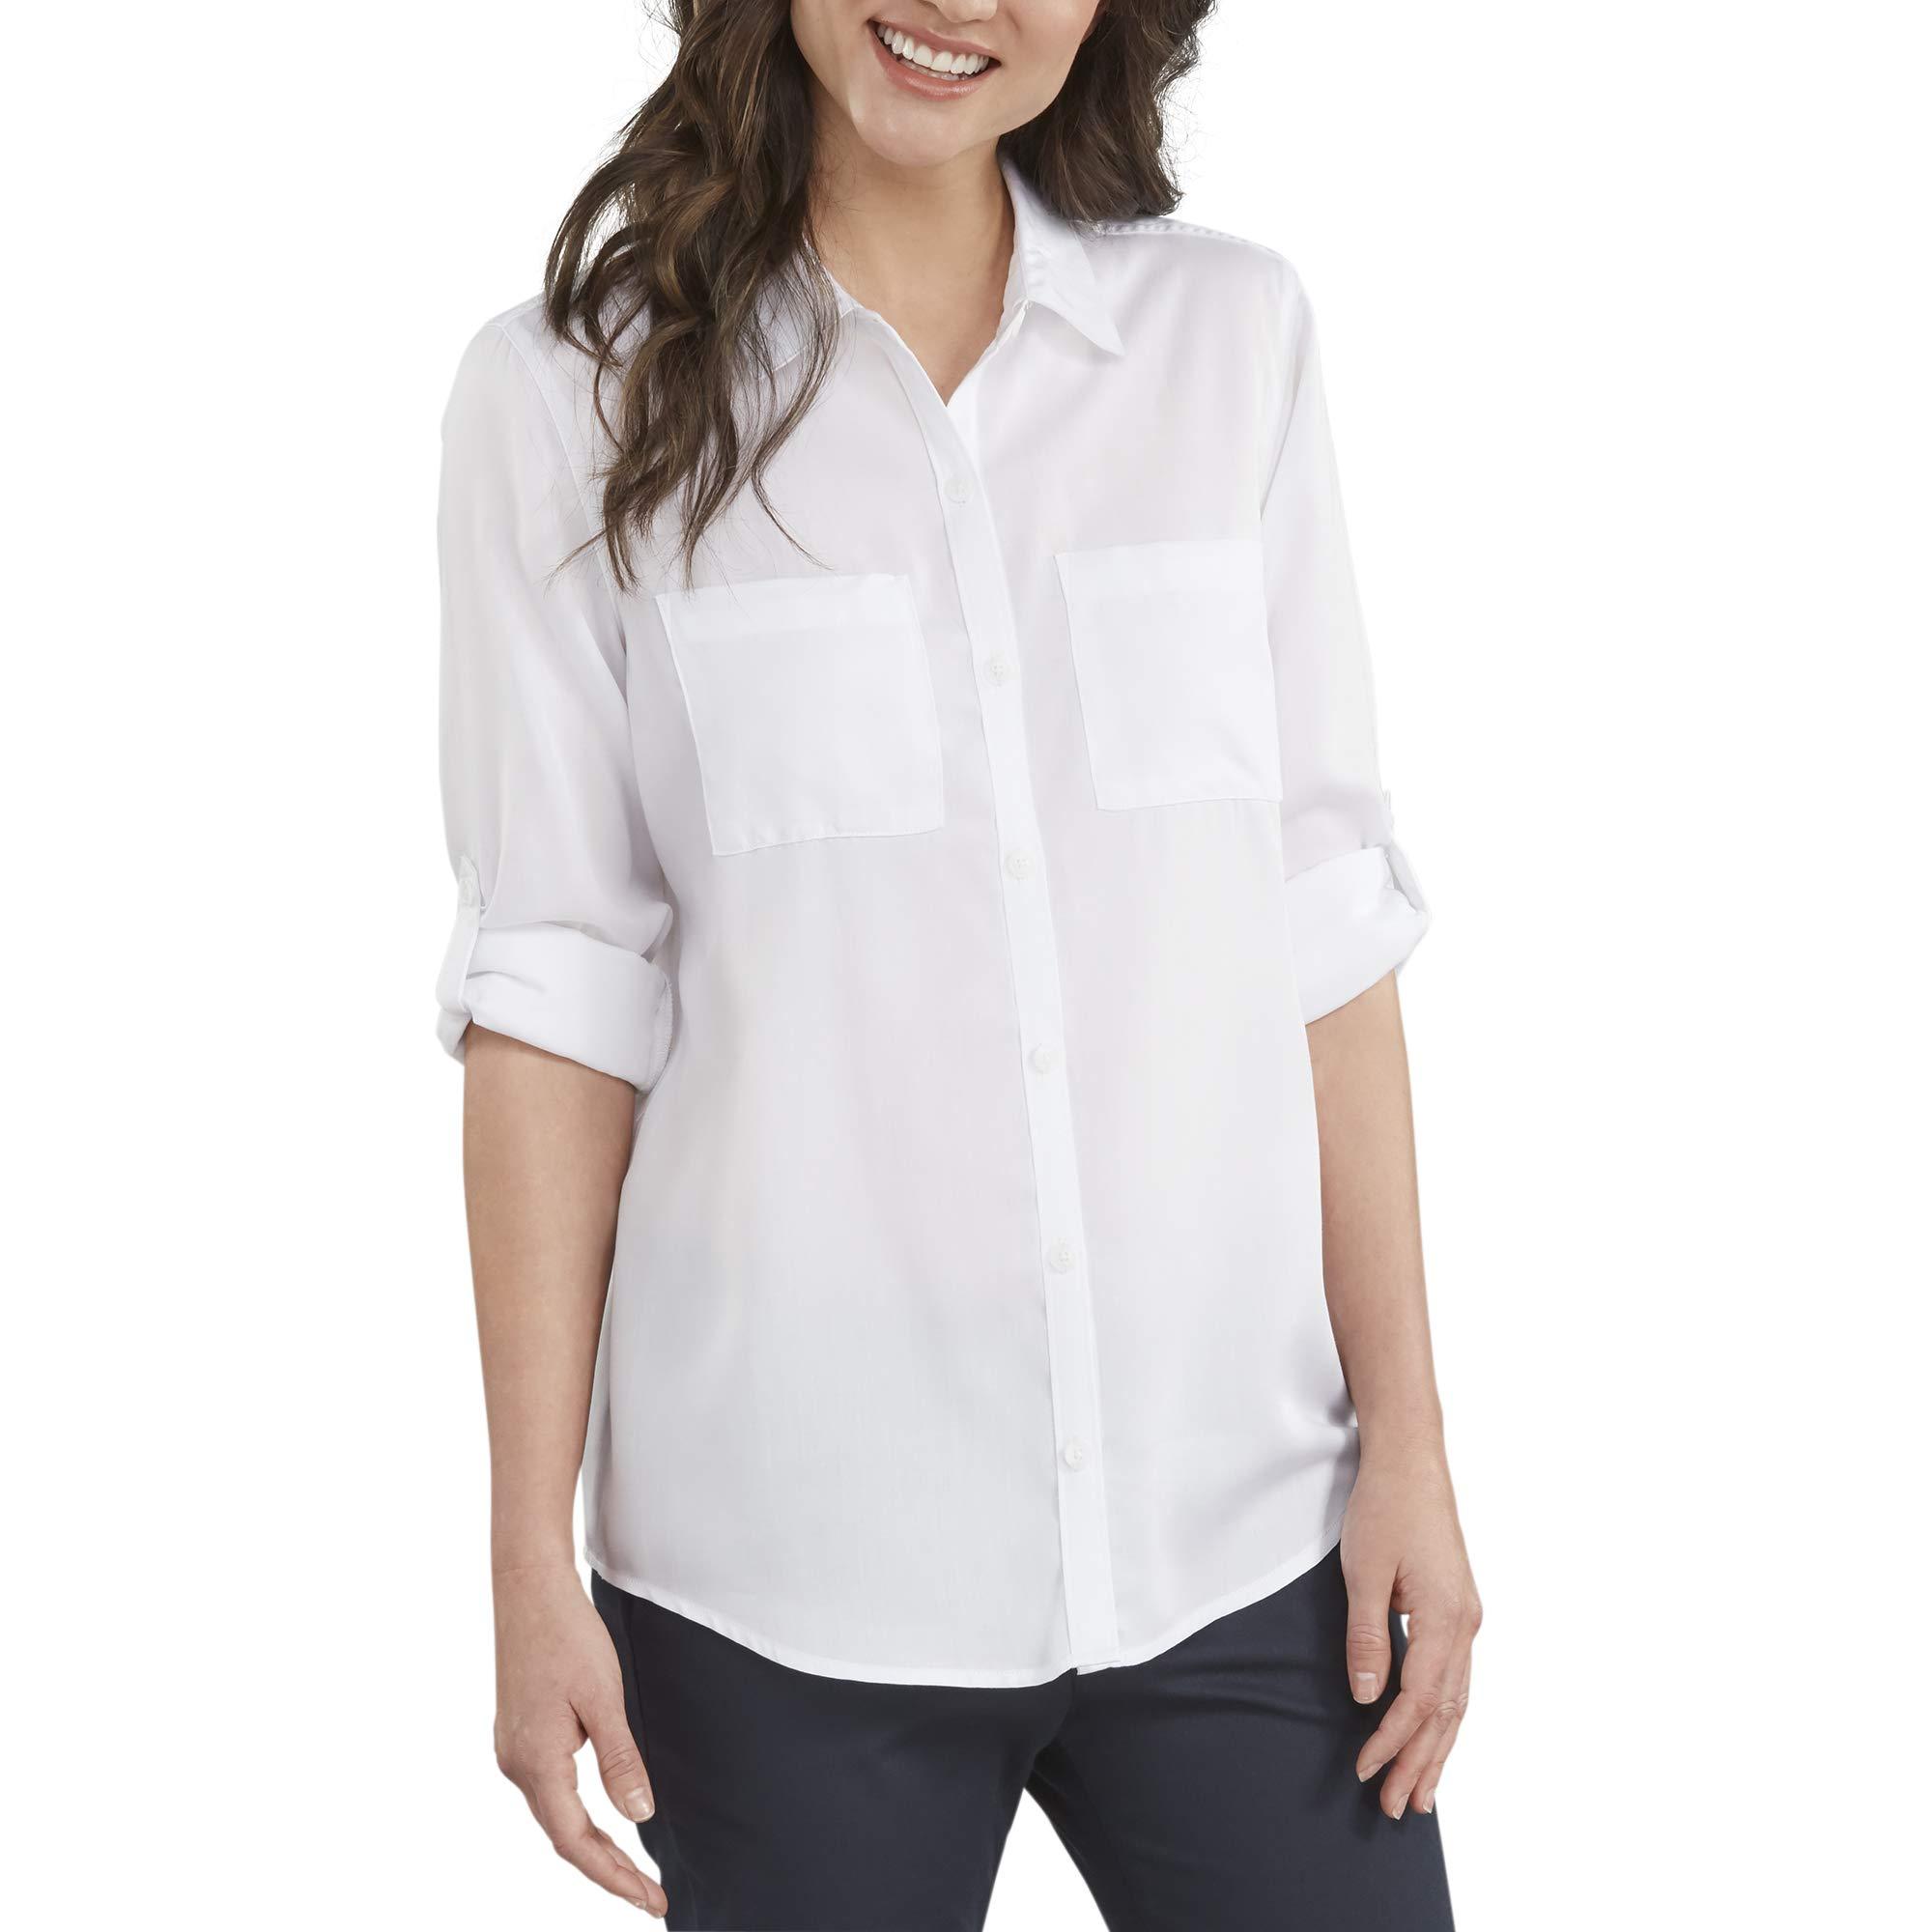 Dickies Women's Long Sleeve Lyocell Button Up Shirt